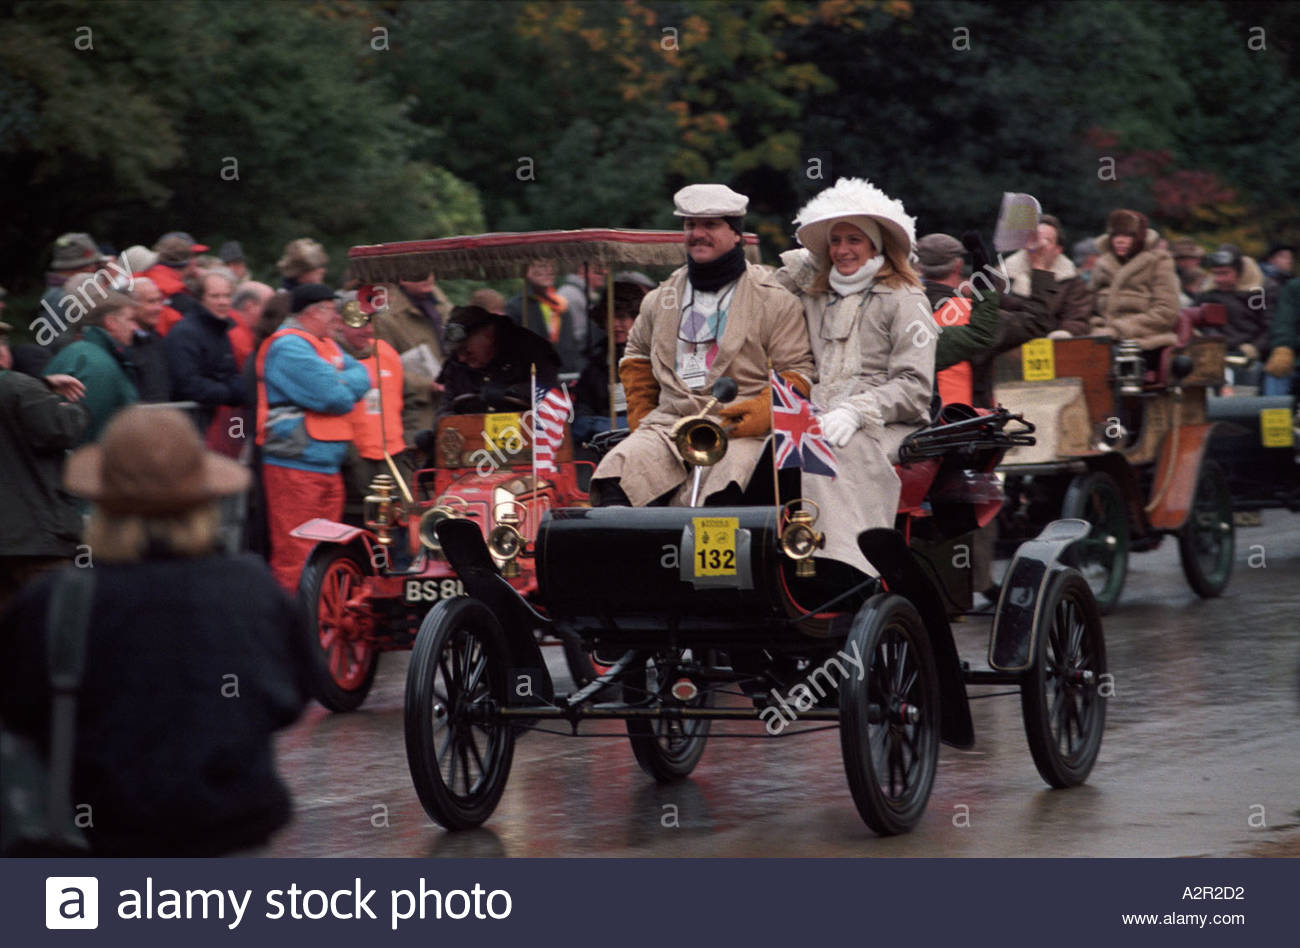 Start of London to Brighton Veteran Car Run in Hyde Park, London, UK - Stock Image